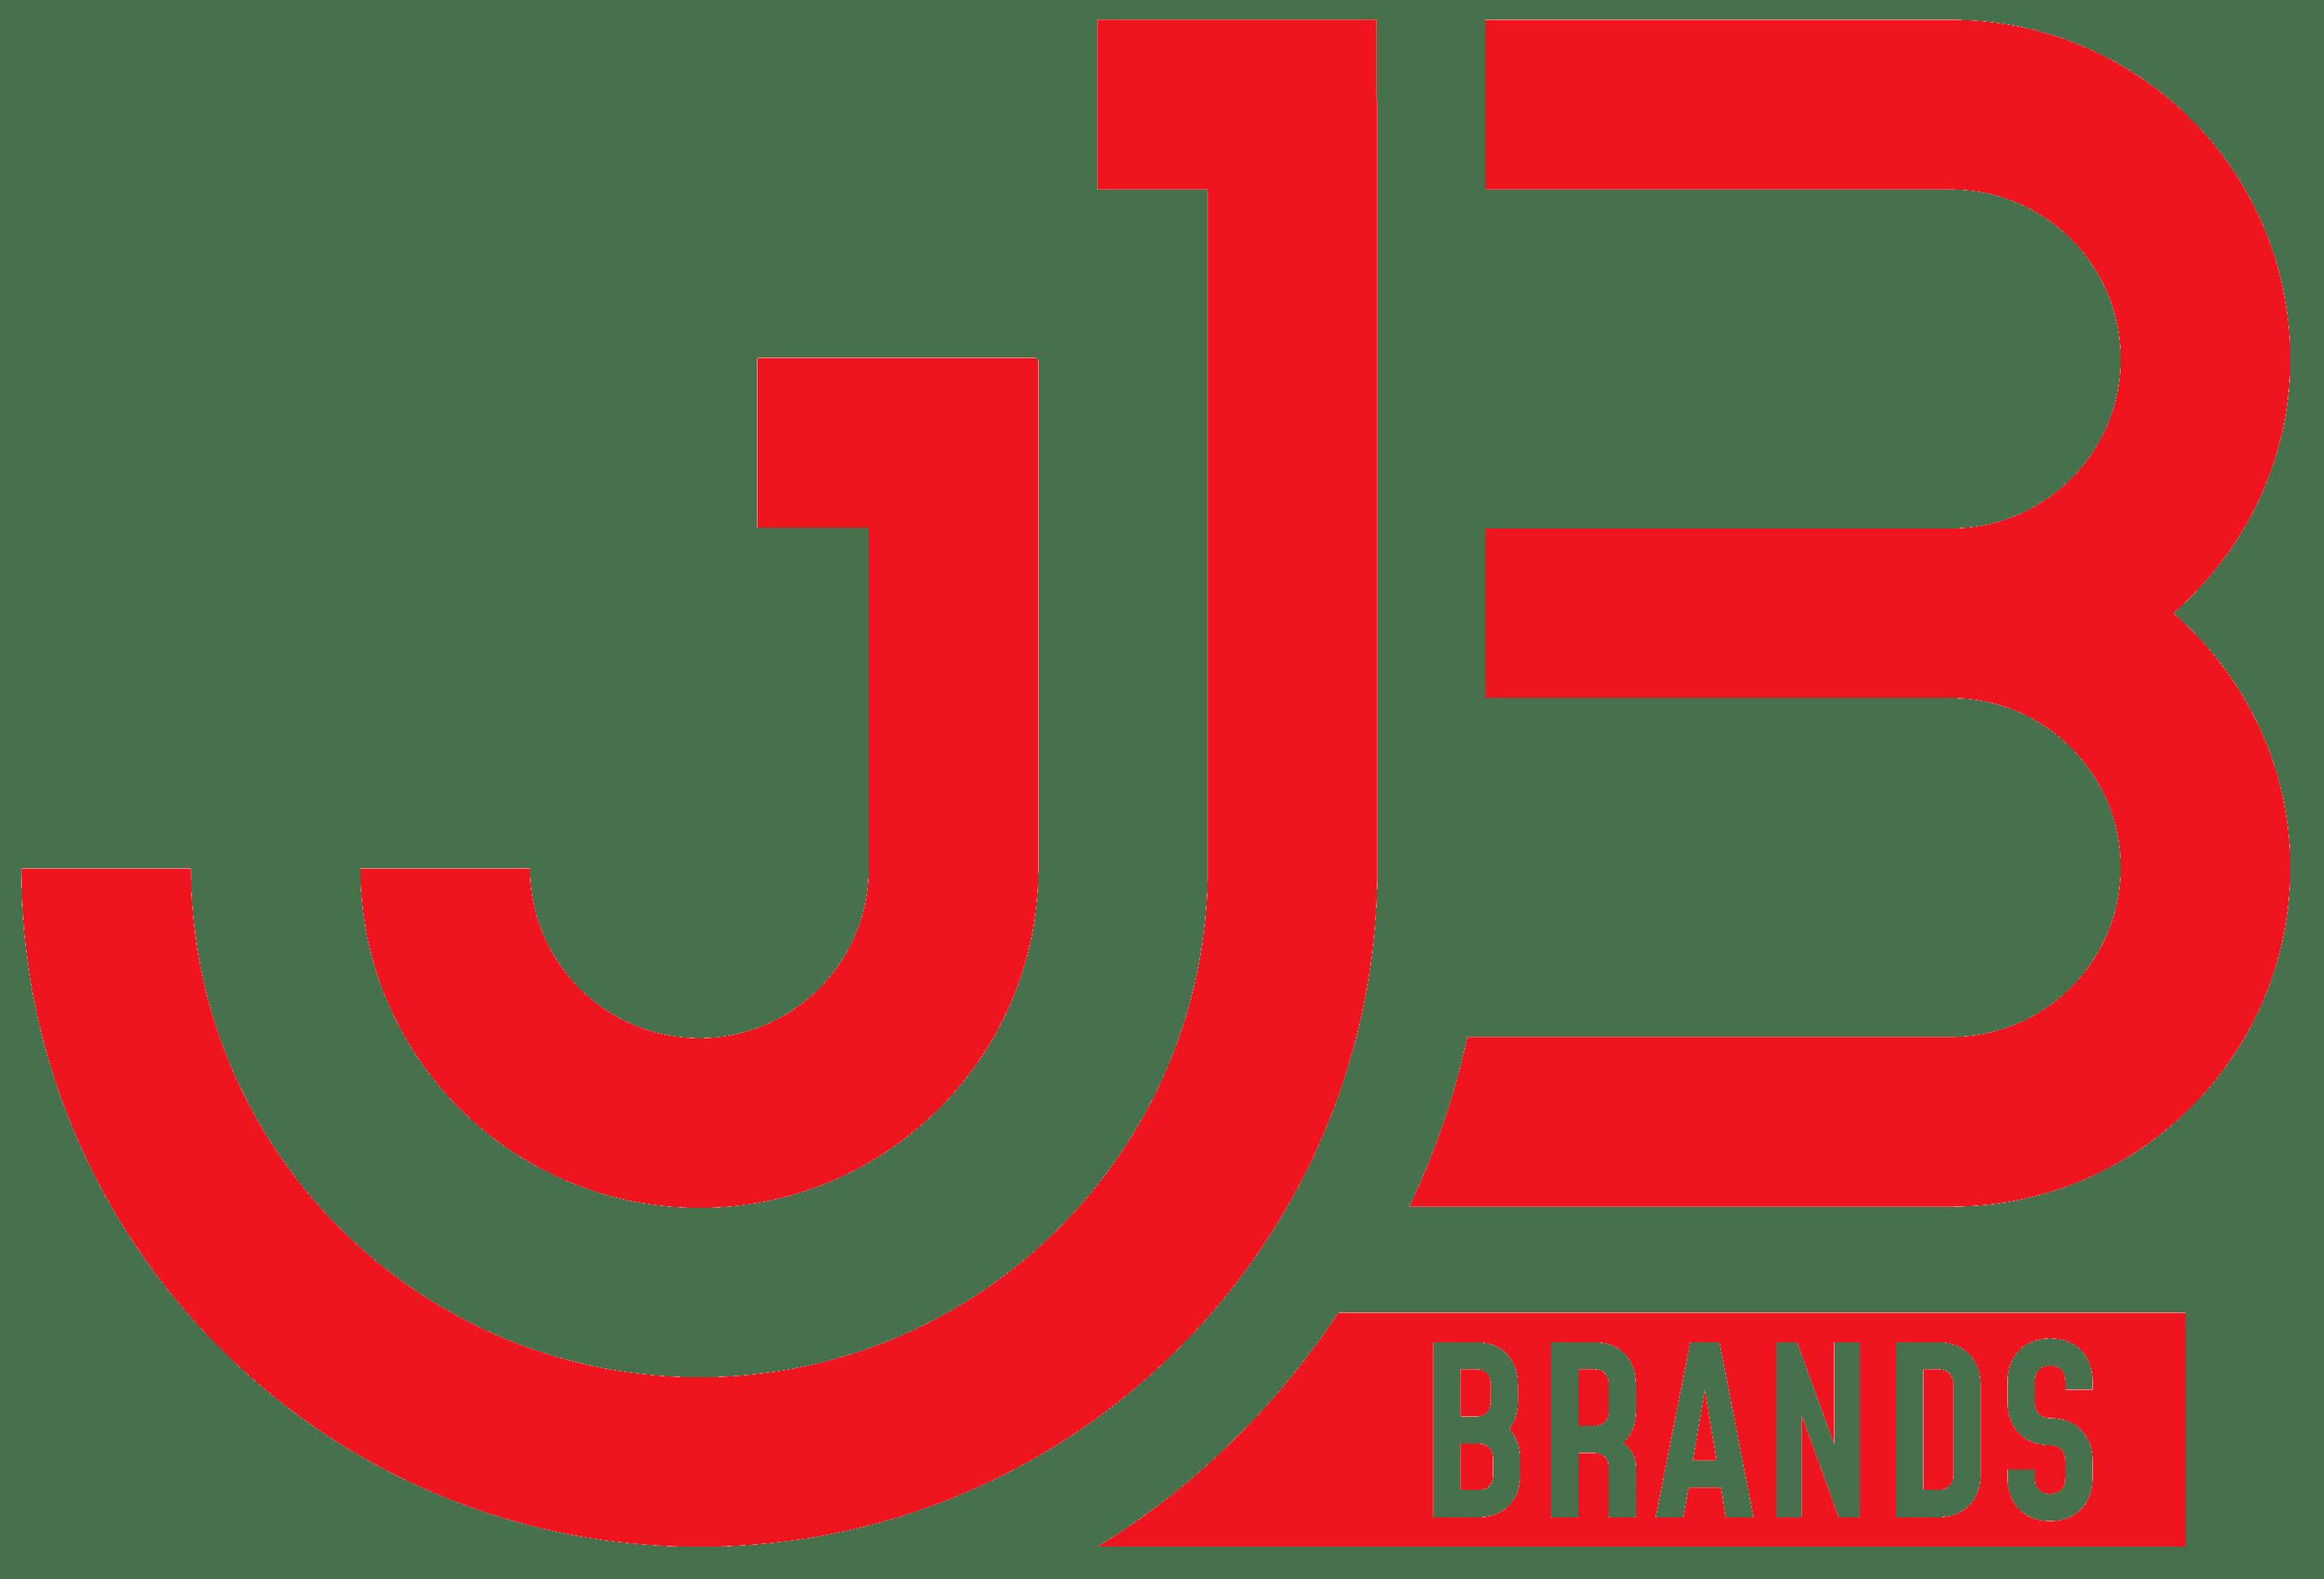 JJB Brands